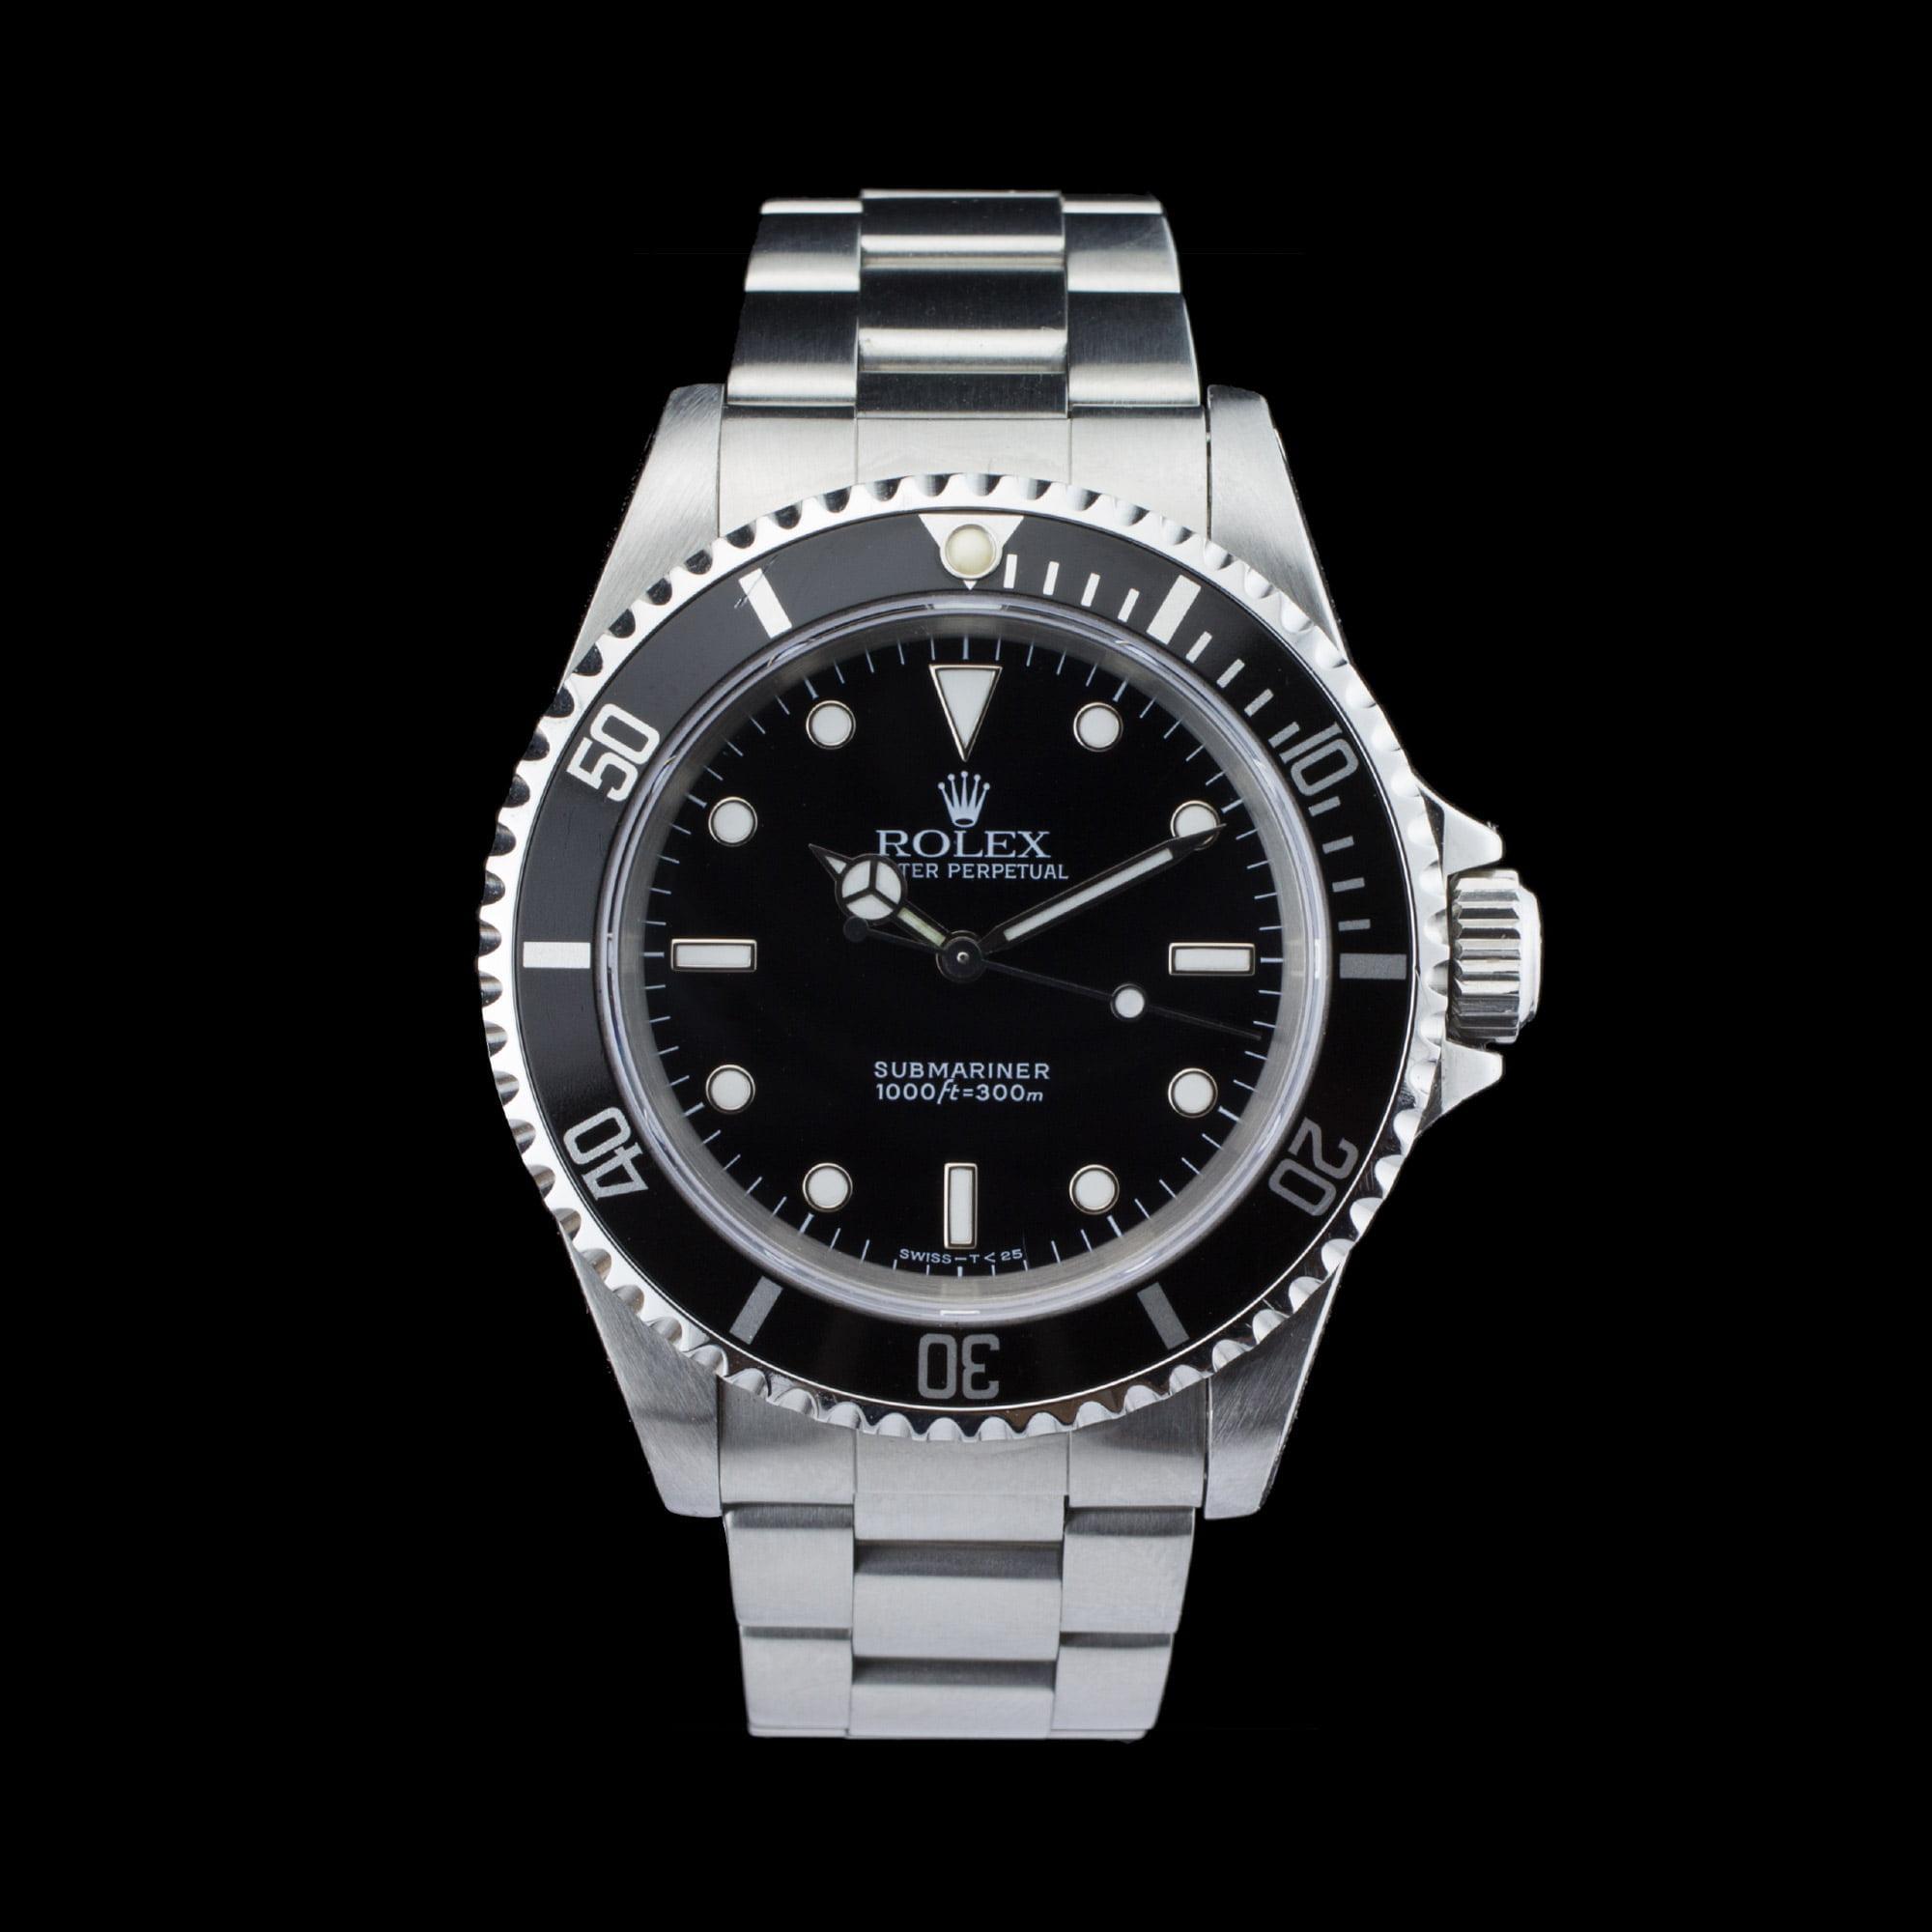 rolex submariner 14060 amsterdam vintage watches. Black Bedroom Furniture Sets. Home Design Ideas